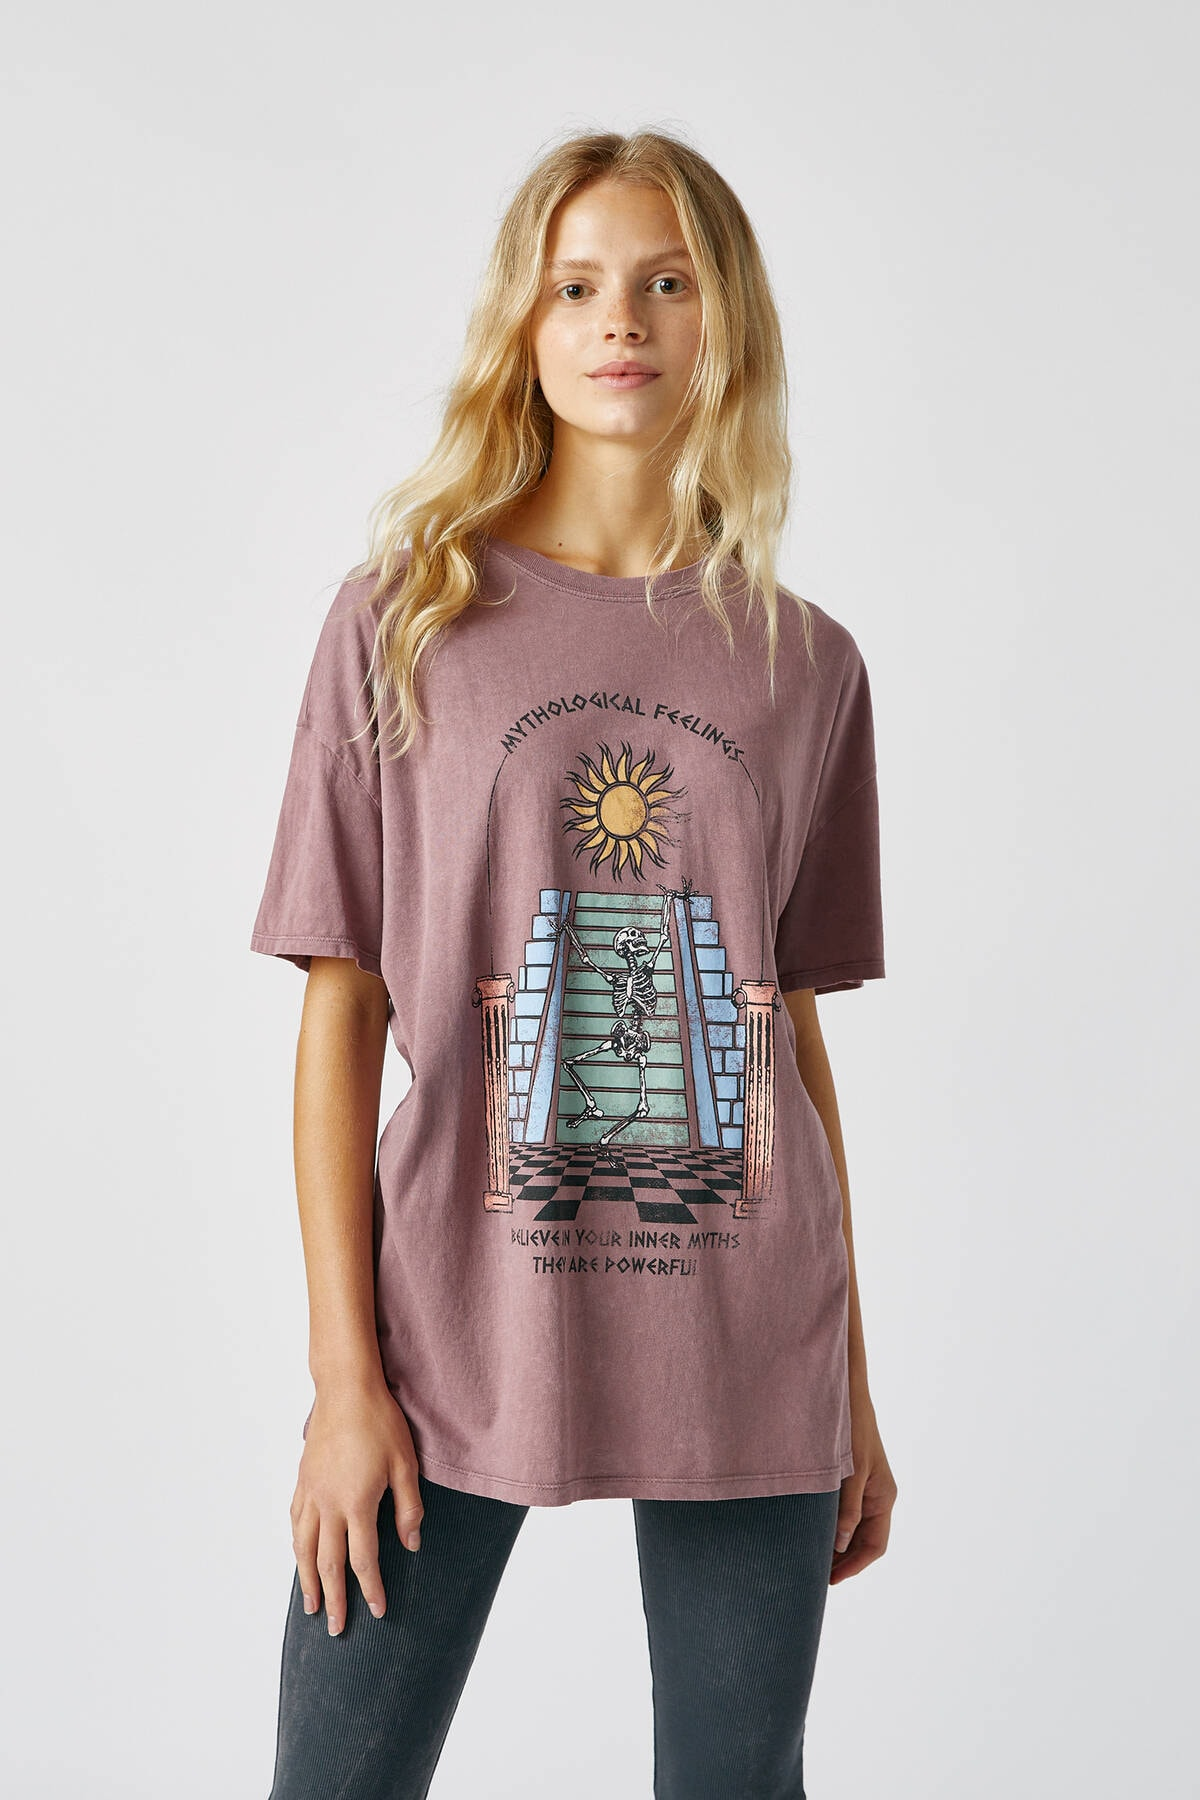 Pull & Bear Kadın Pastel Leylak Rengi İskelet Desenli T-Shirt 09247375